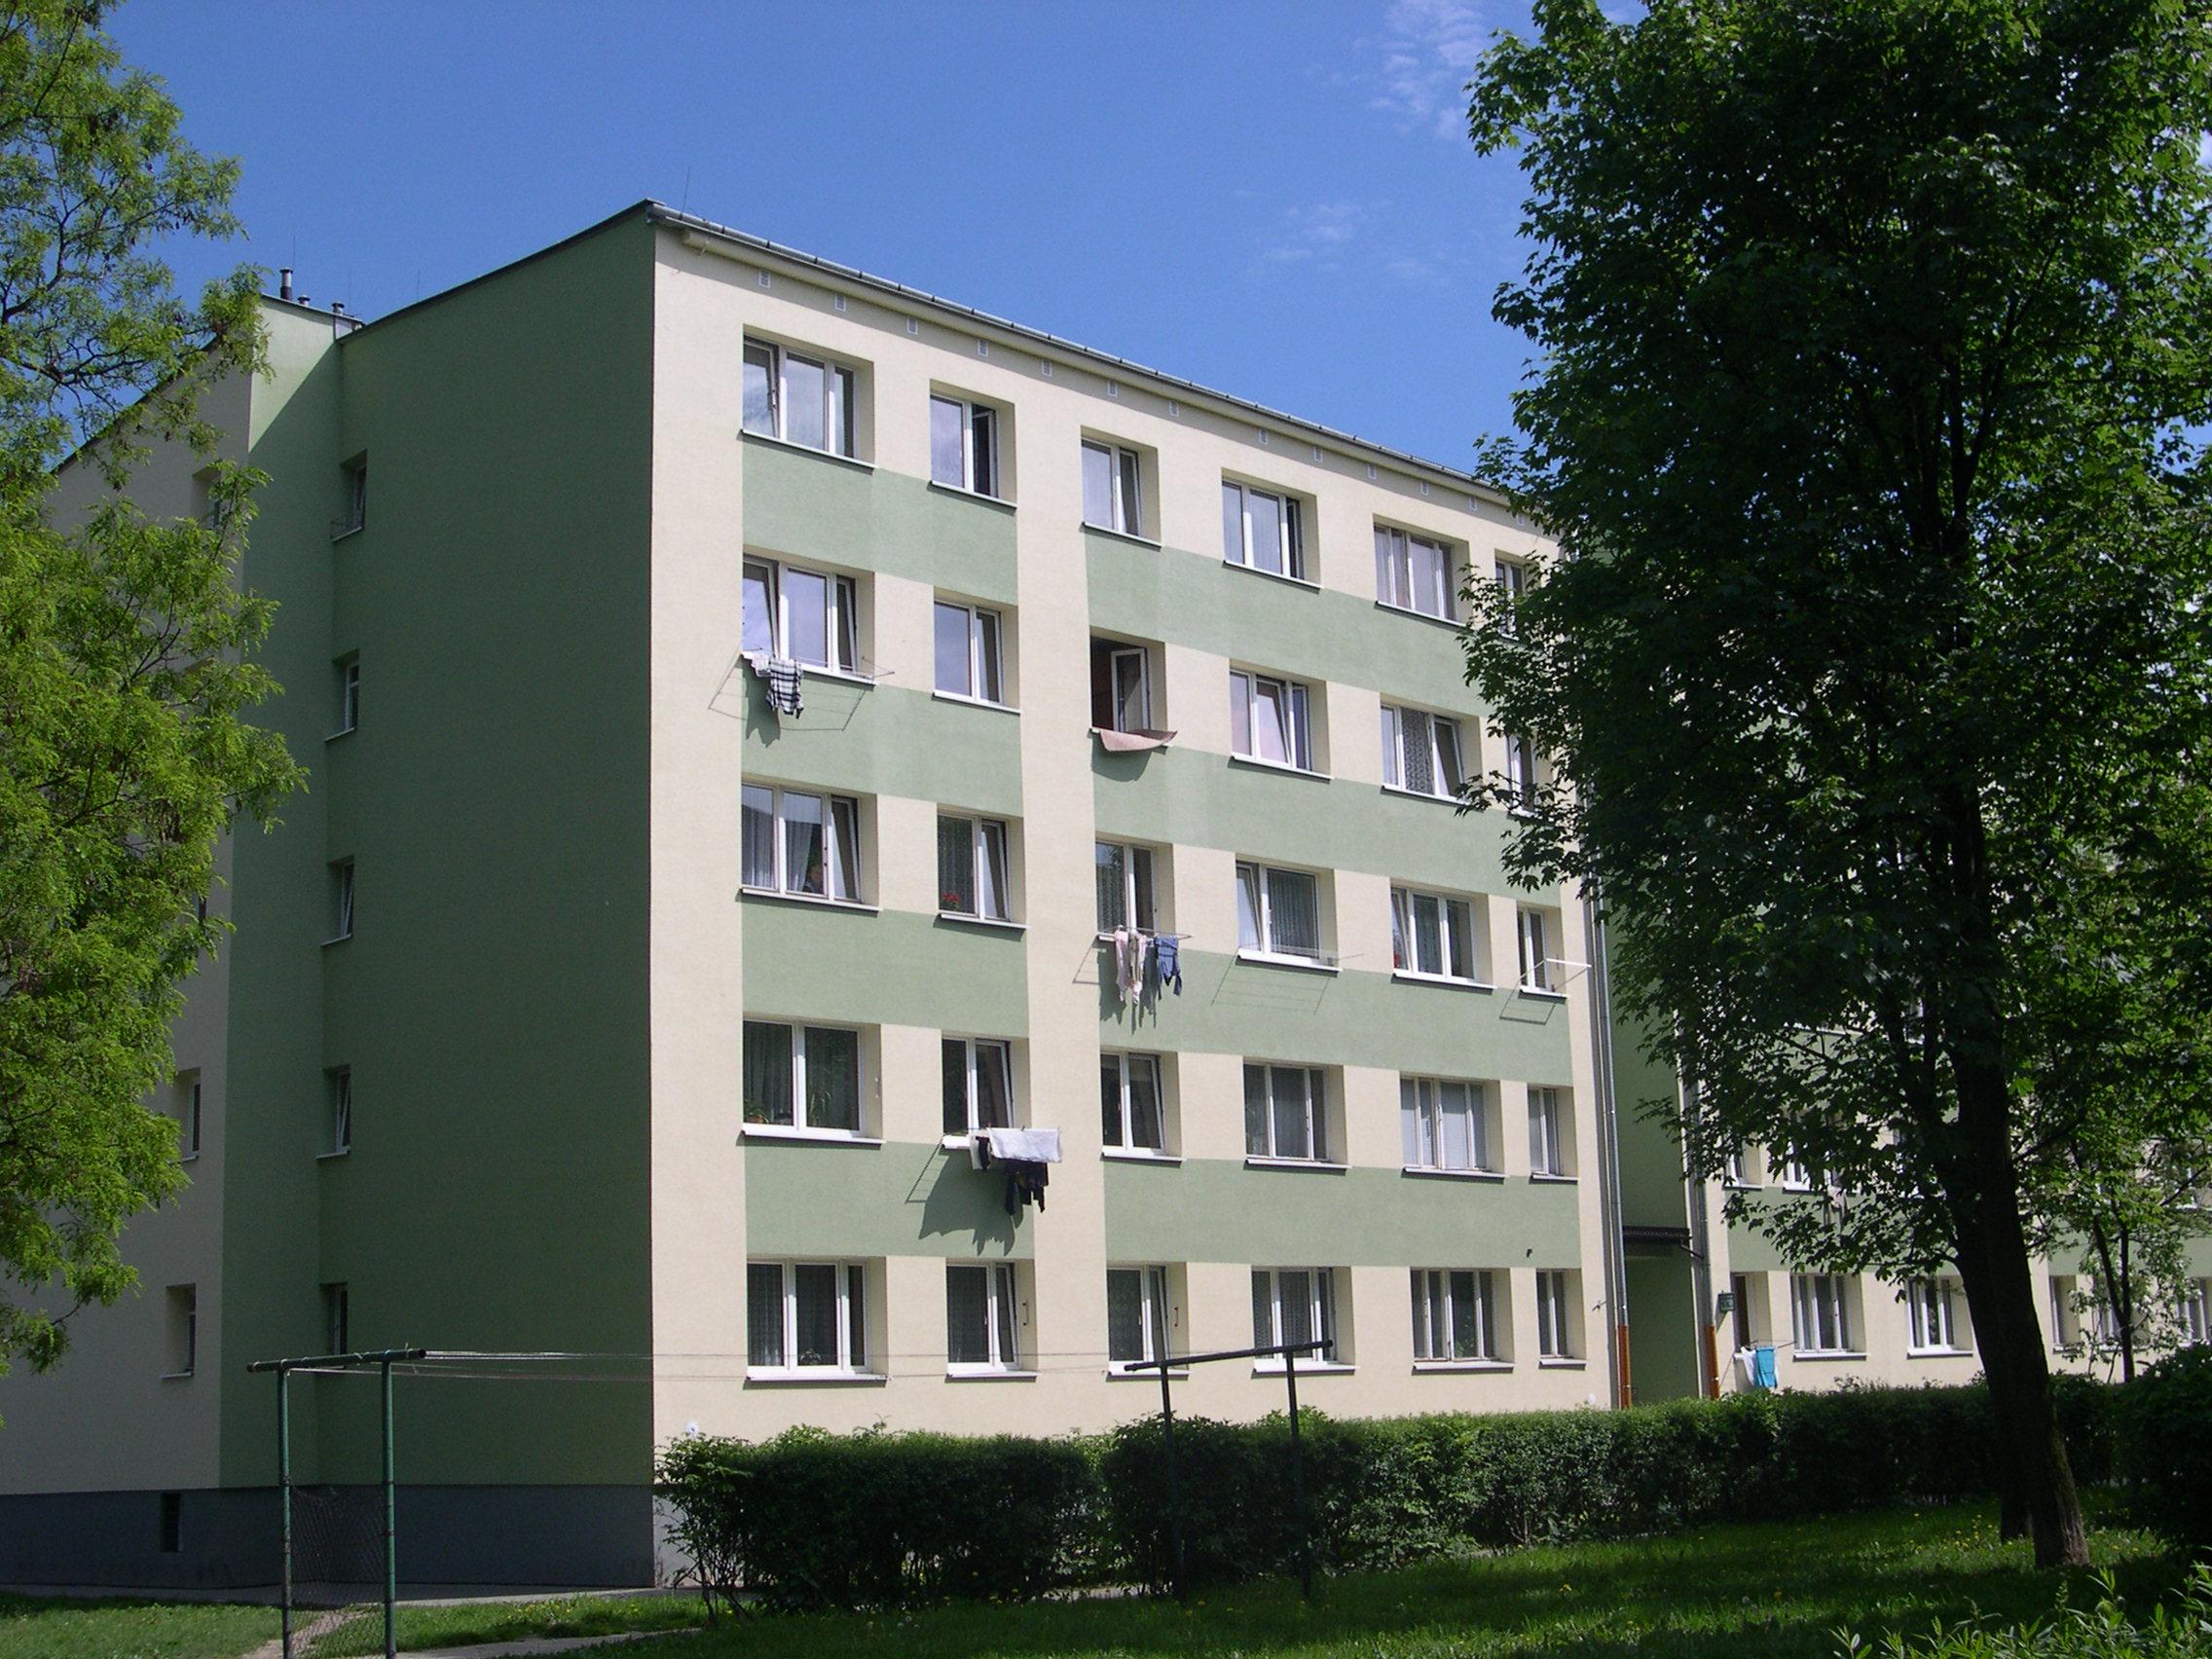 http://upload.wikimedia.org/wikipedia/commons/b/ba/Krakow-Azory_blok.jpg